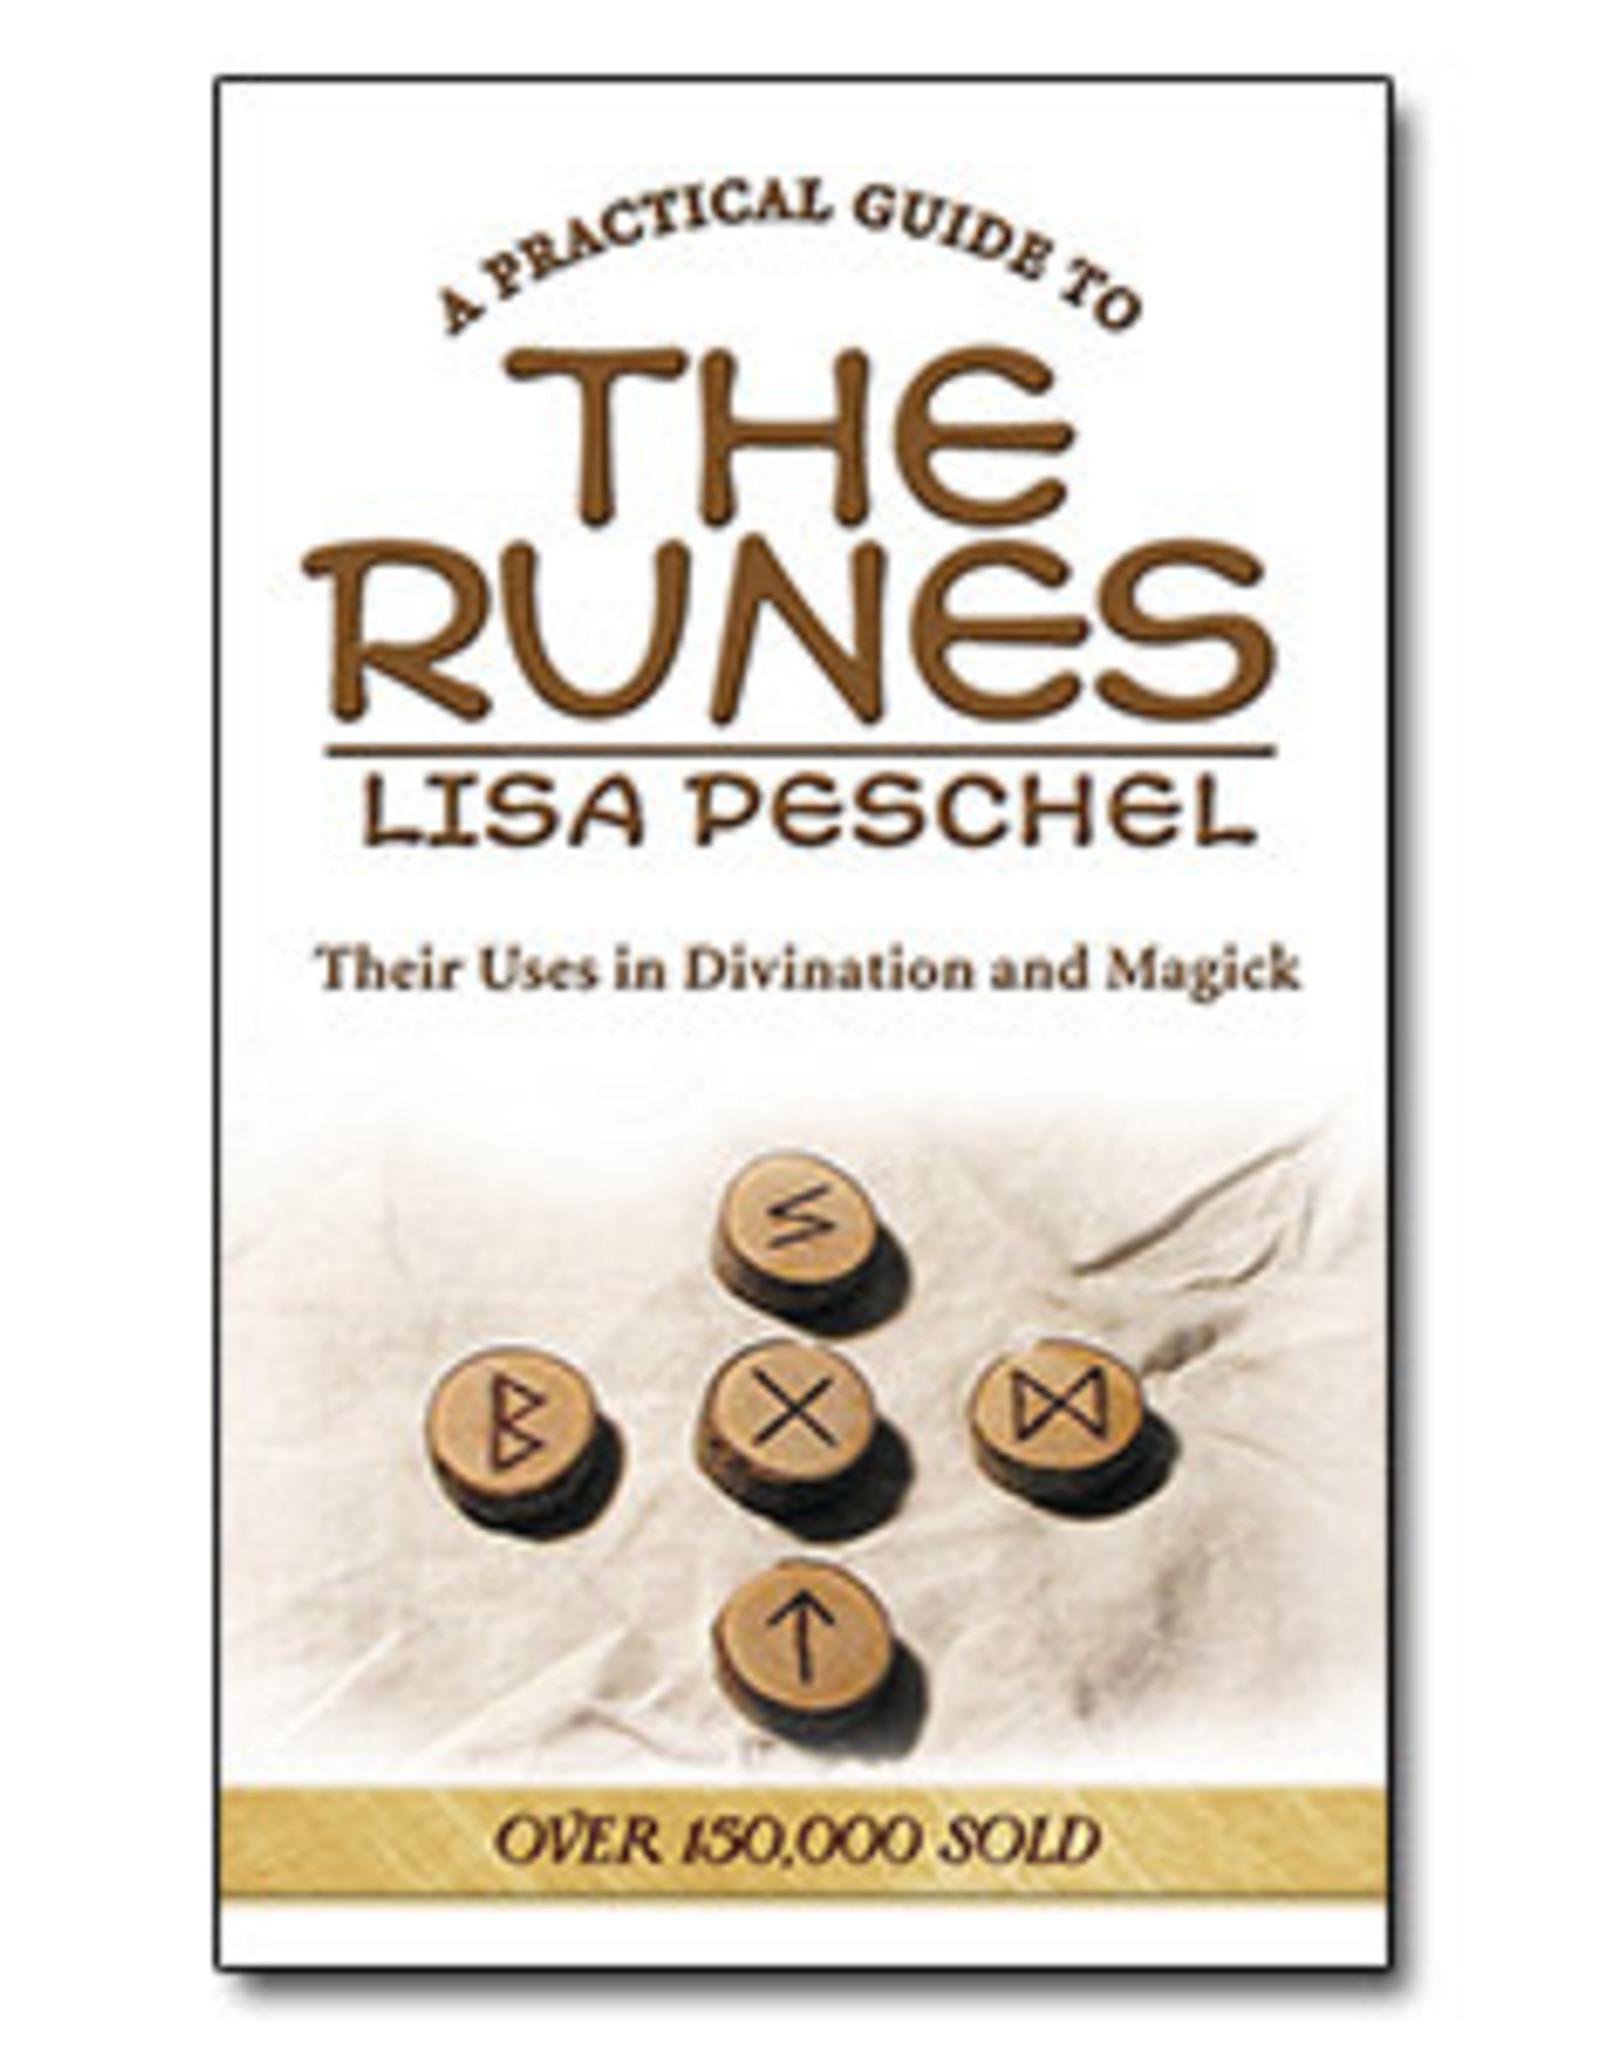 Lisa Peschel Practical Guide To The Runes by Lisa Peschel